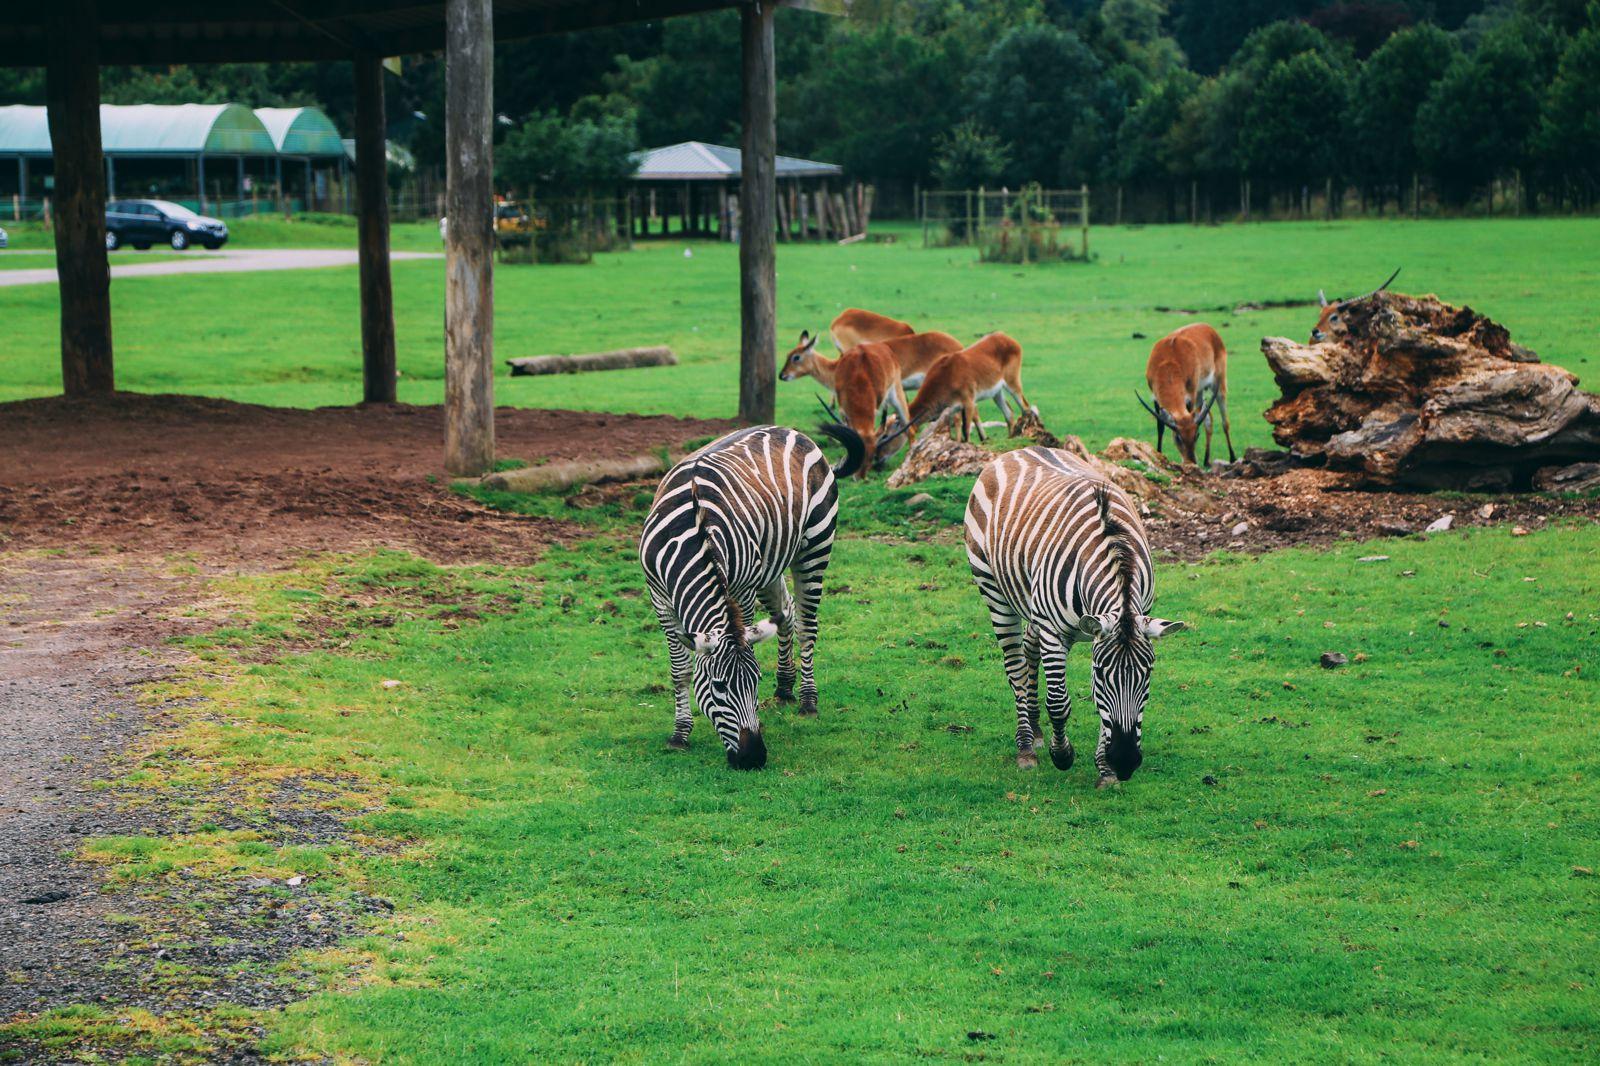 Safari In Scotland - The Photo Diary at Blair Drummond Safari and Adventure Park (2)